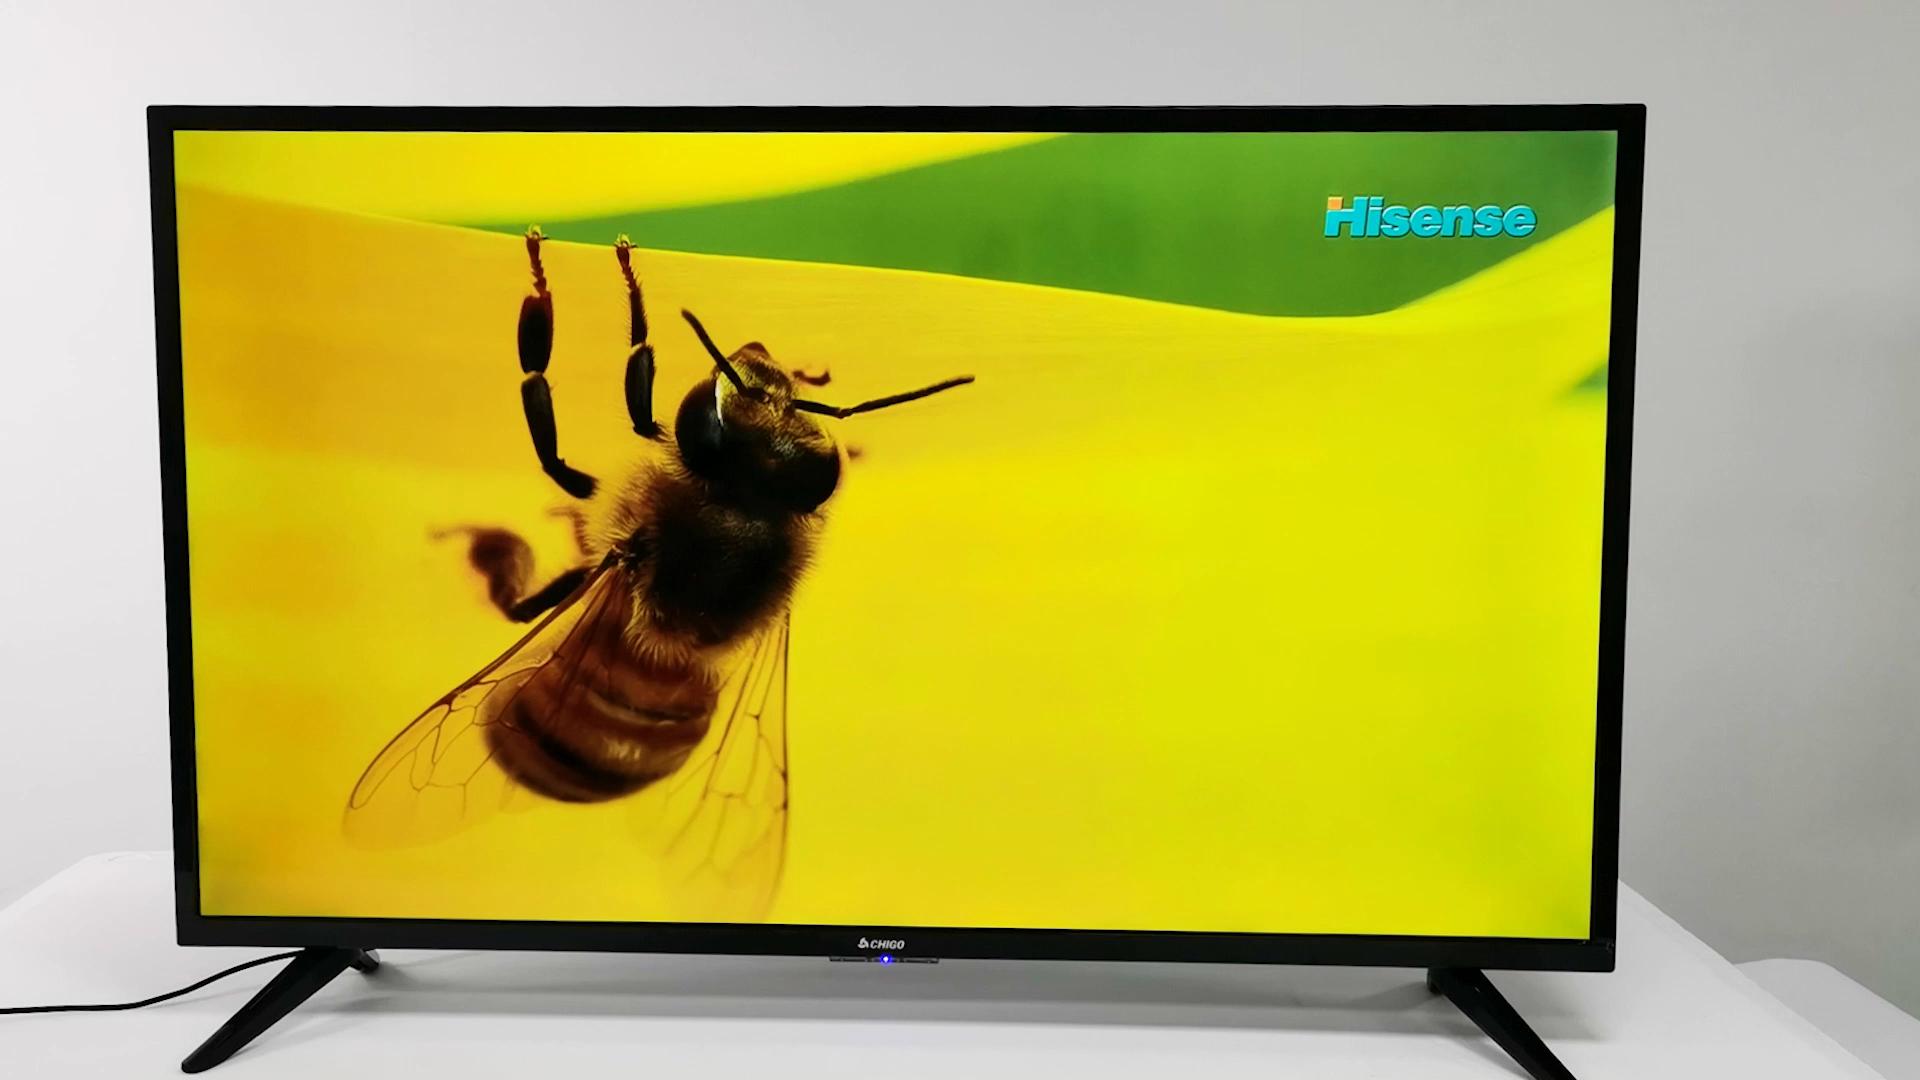 OEM 도매 32 인치 LED TV 소형 텔레비전 스마트 HD 전체 블랙 컬러 디지털 TV